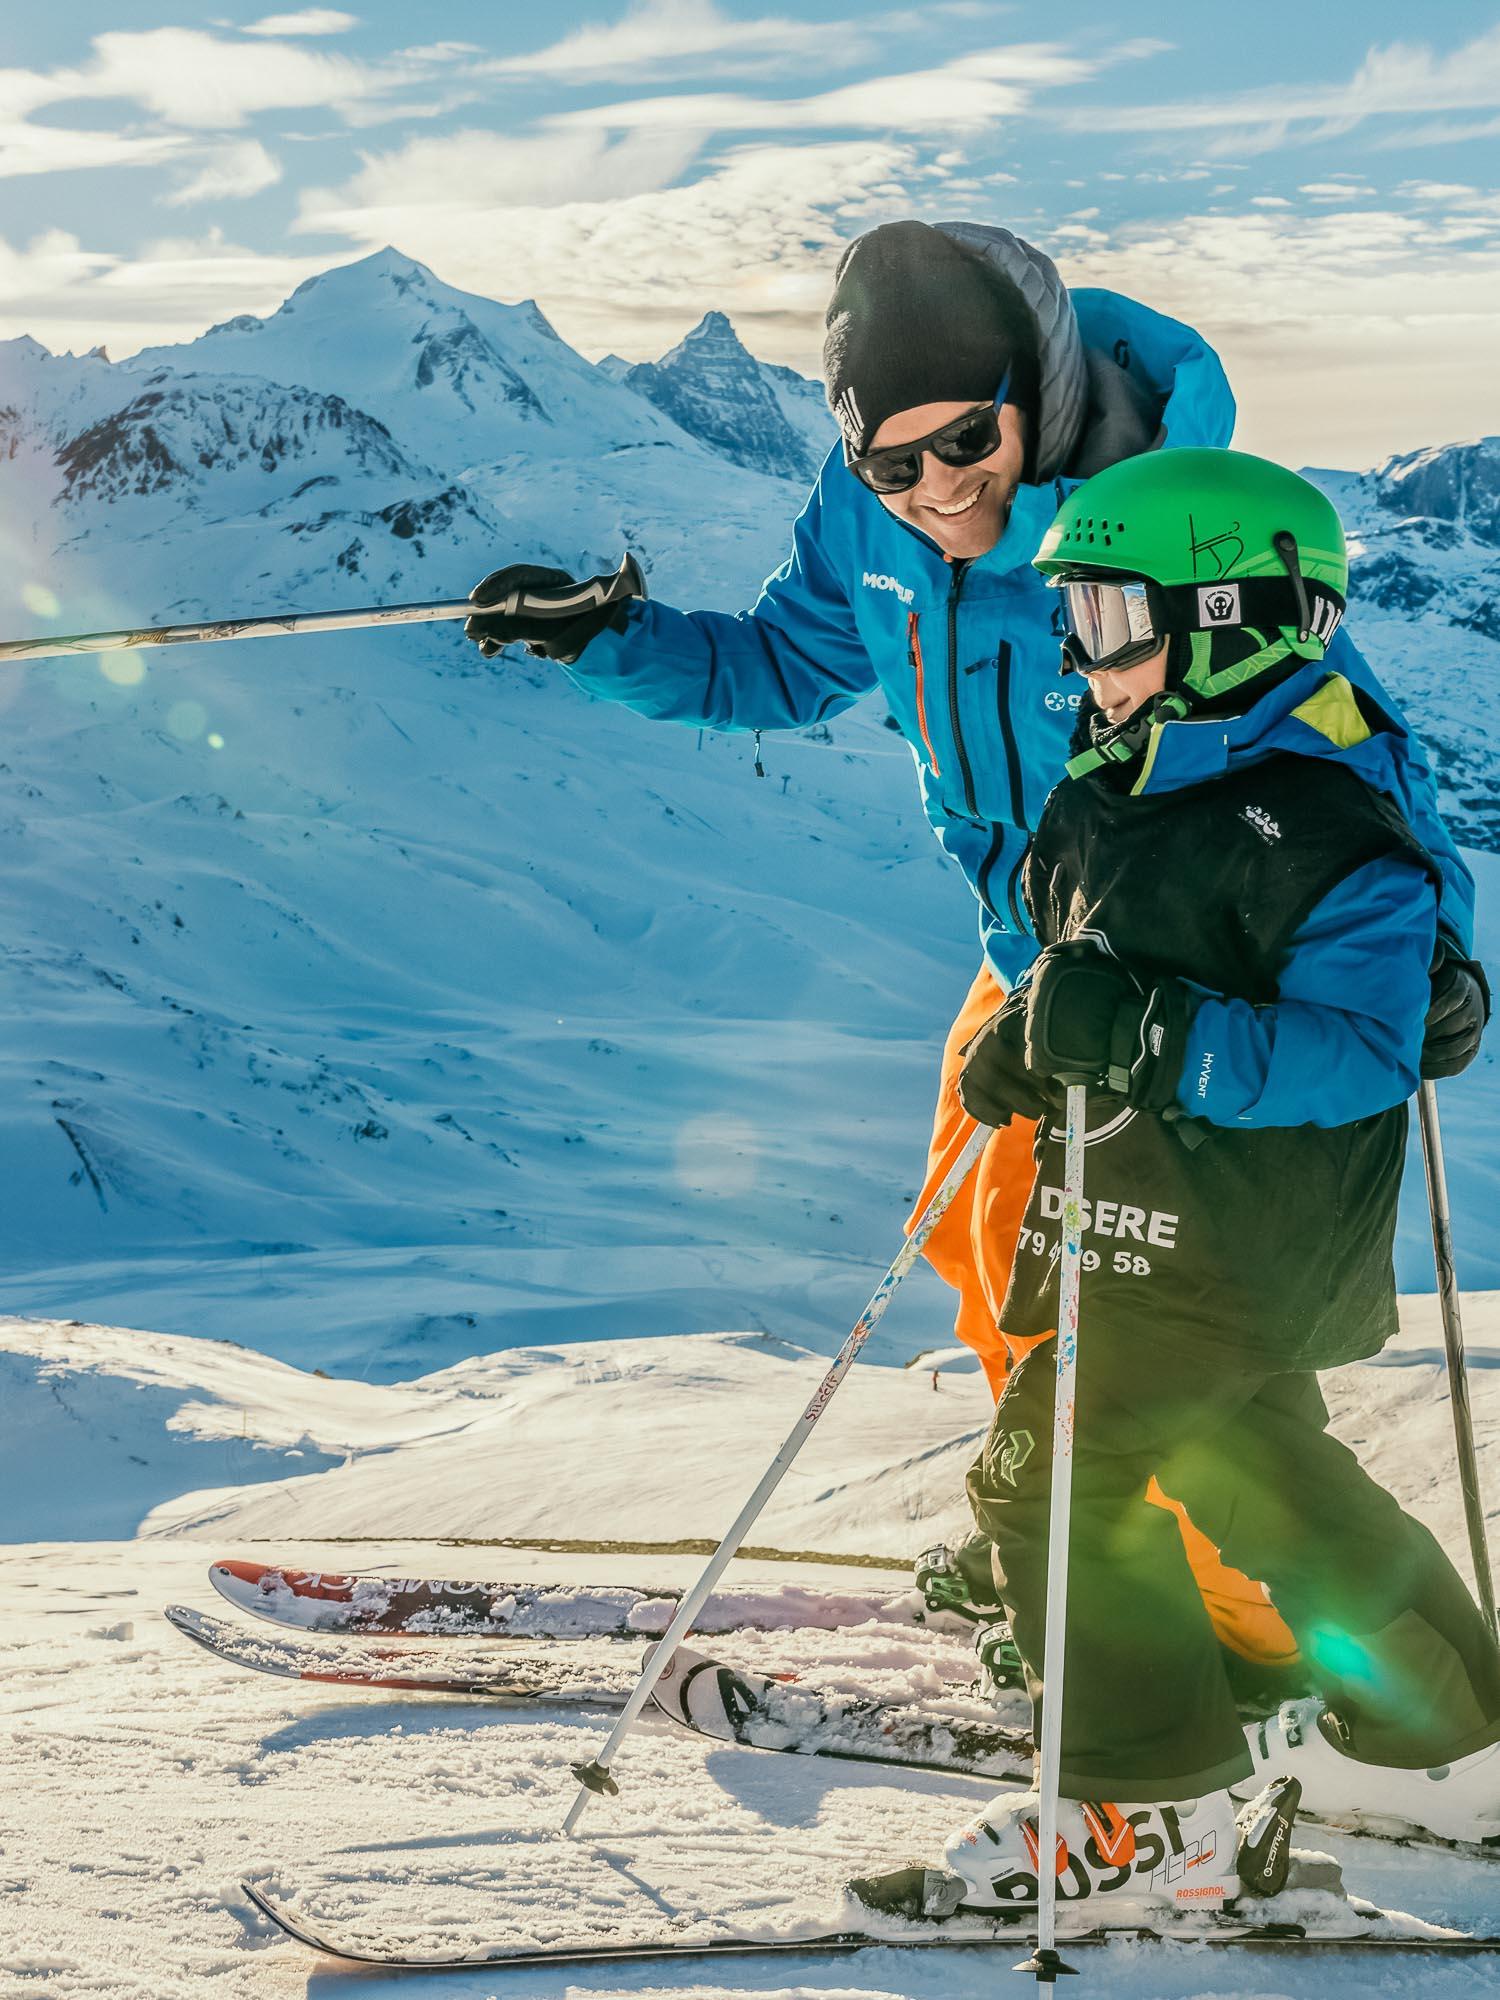 cours collectifs de ski pro rider la plagne oxyg ne ecole de ski snowboard. Black Bedroom Furniture Sets. Home Design Ideas